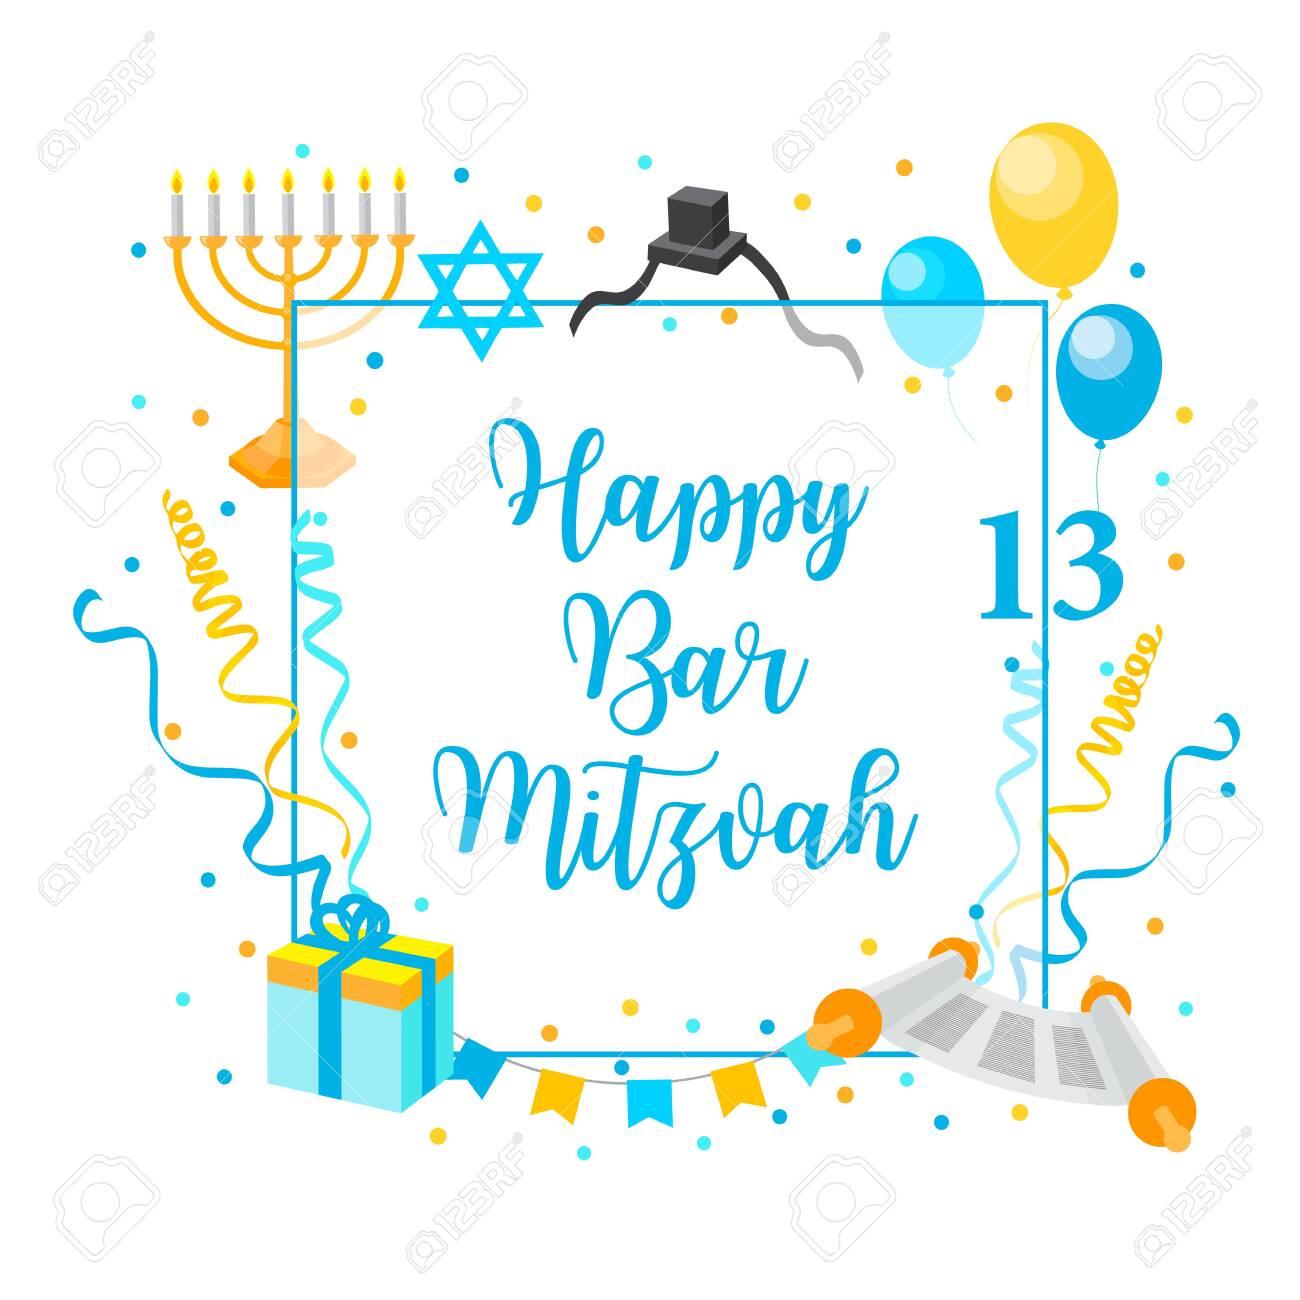 Bar Mitzvah congratulation or invitation card. jewish tradition boys birthday. vector - 143083020